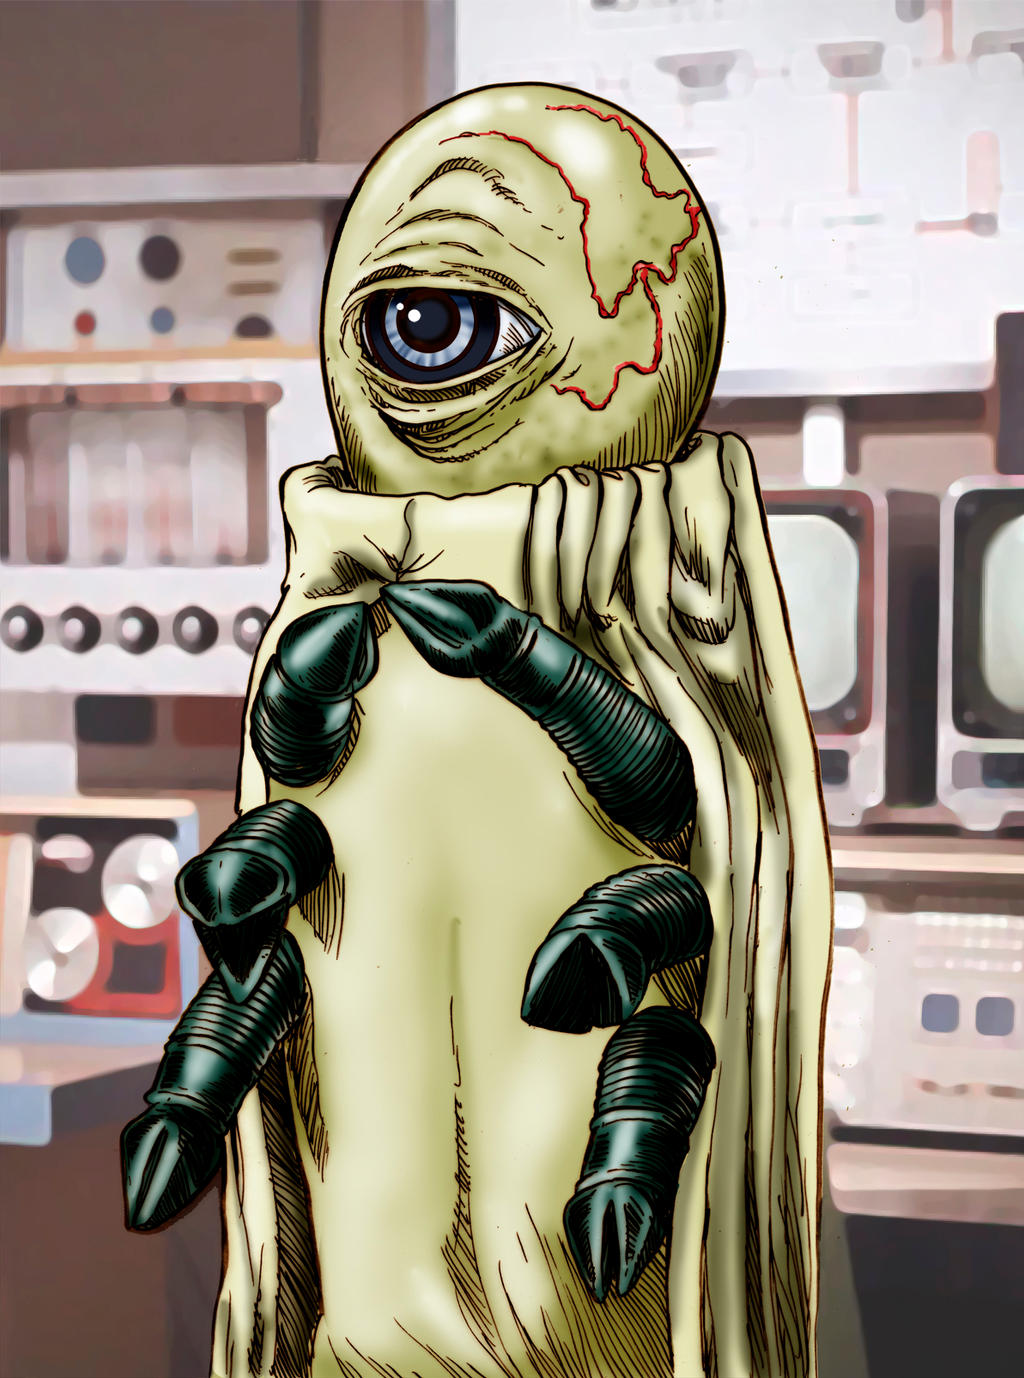 Alpha Centauri, Intrepid Intergalactic Diplomat by Loneanimator